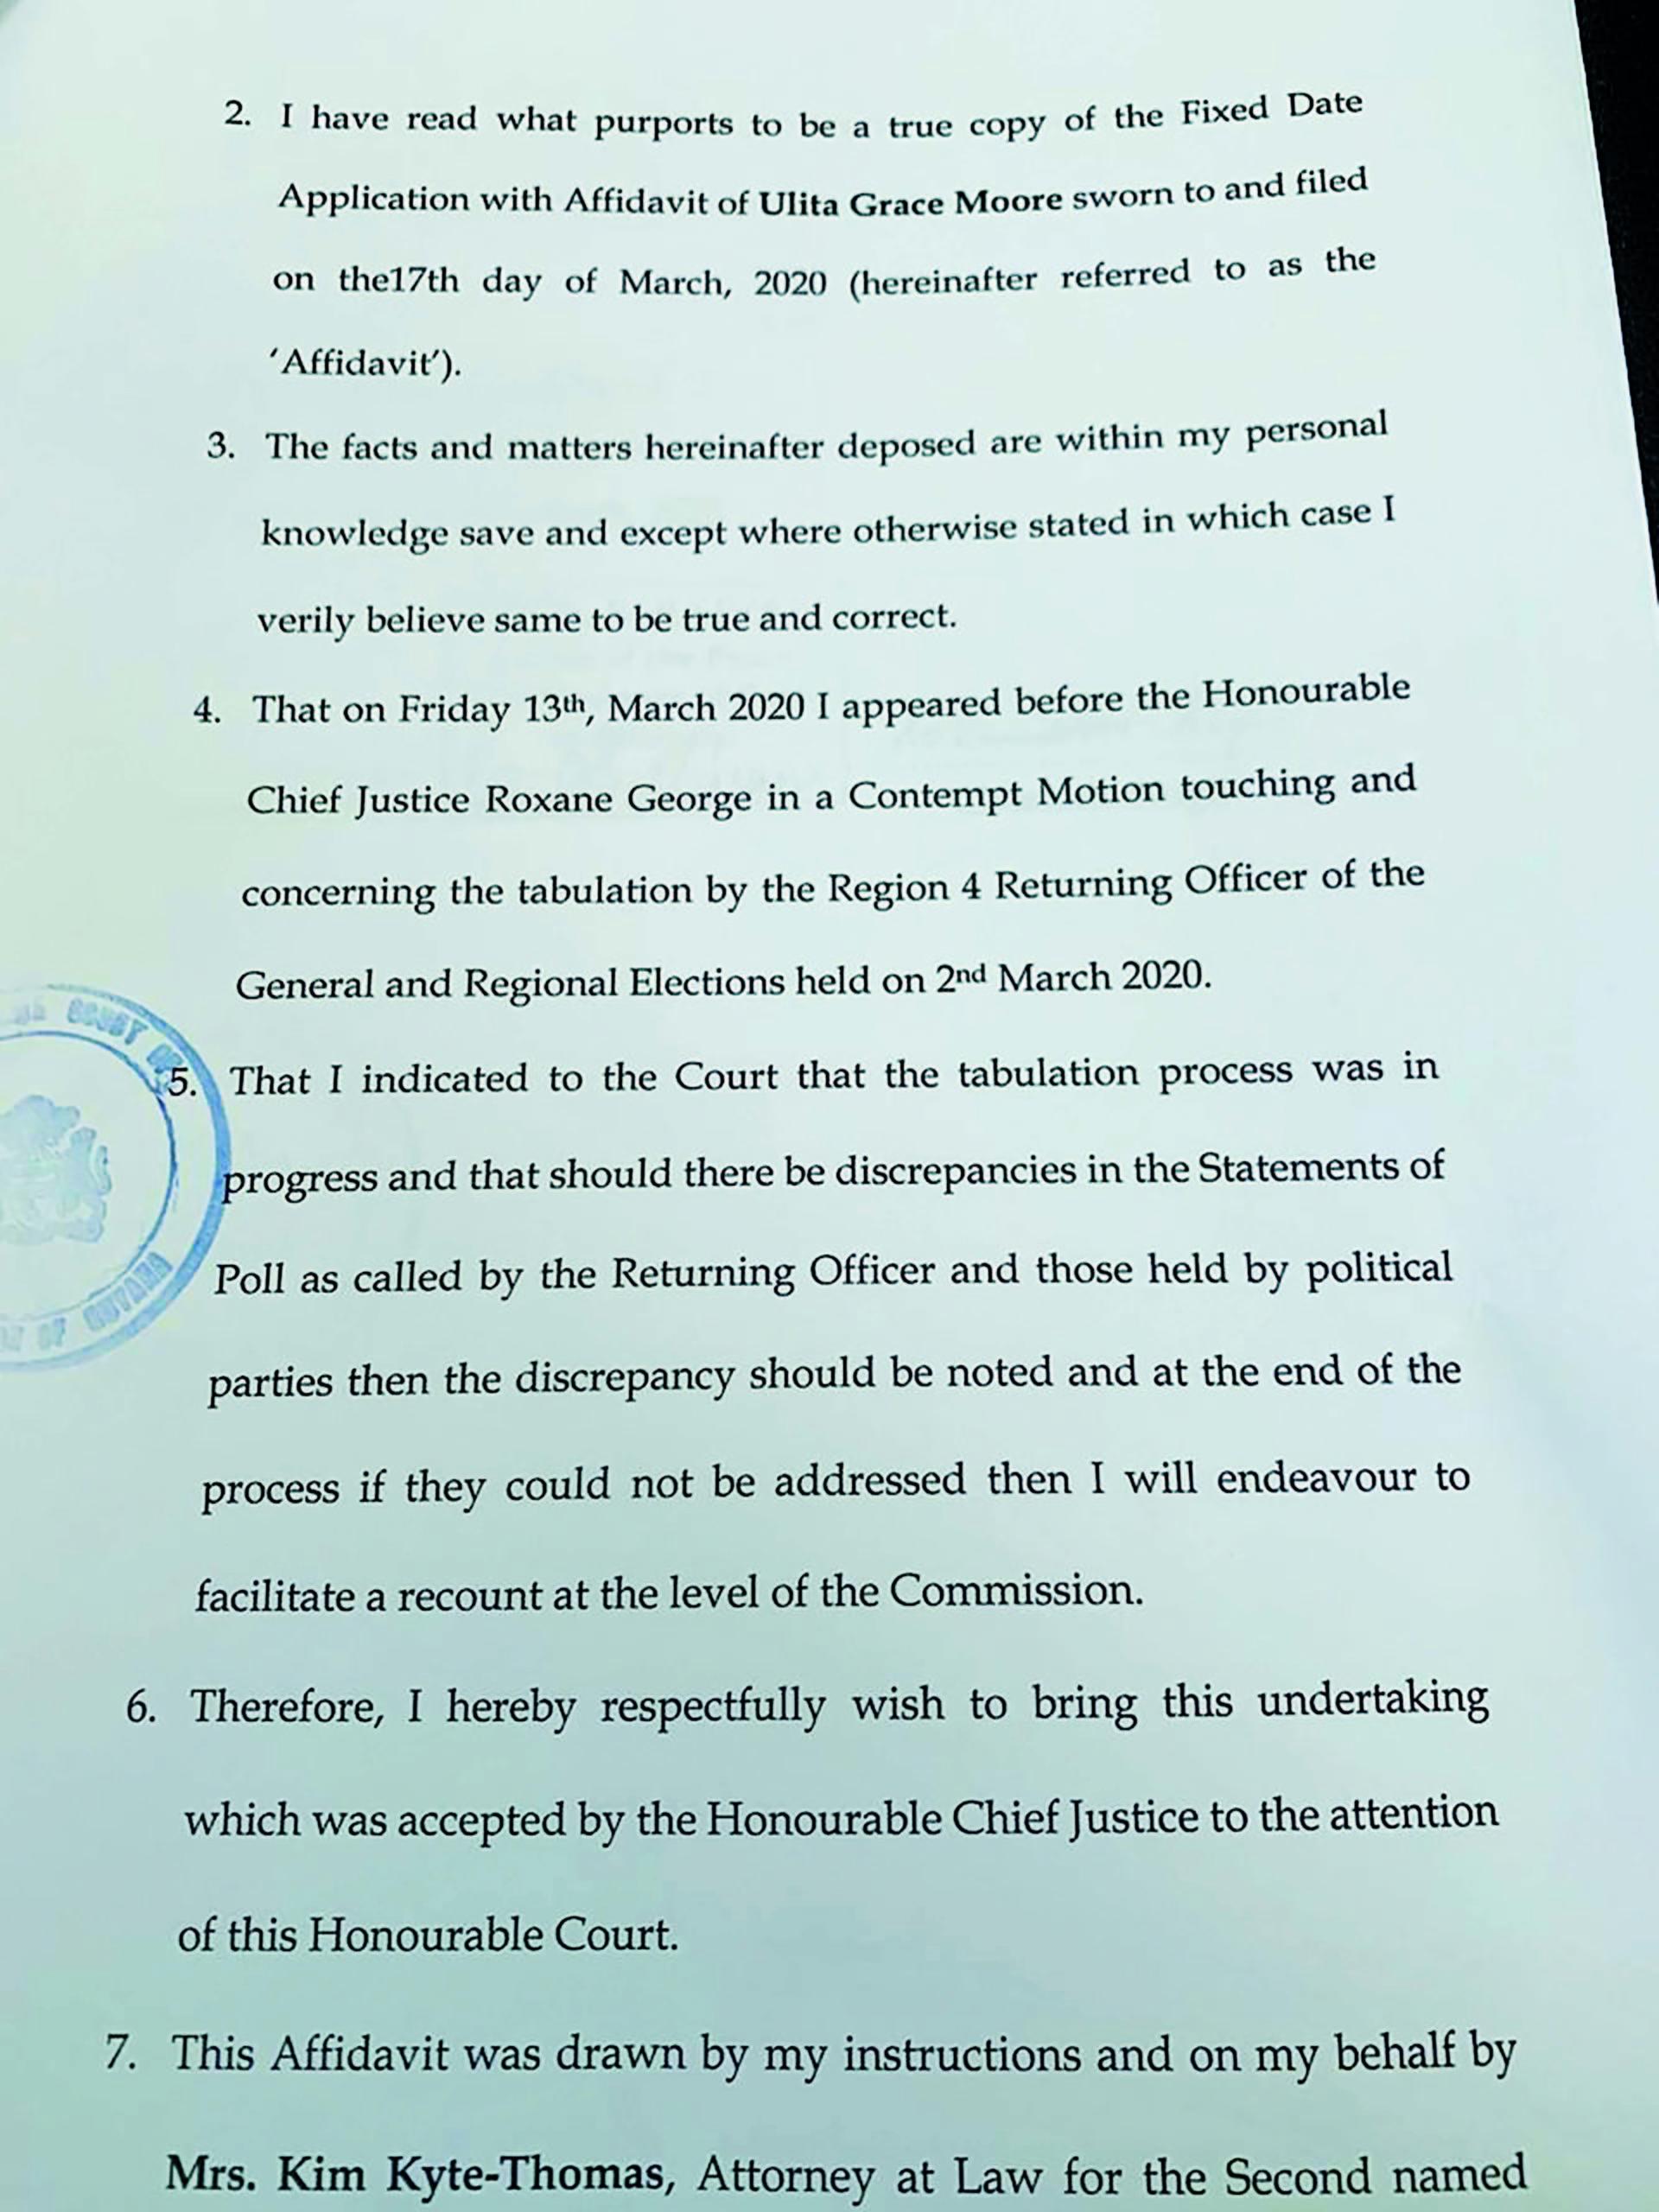 Part of the affidavit filed